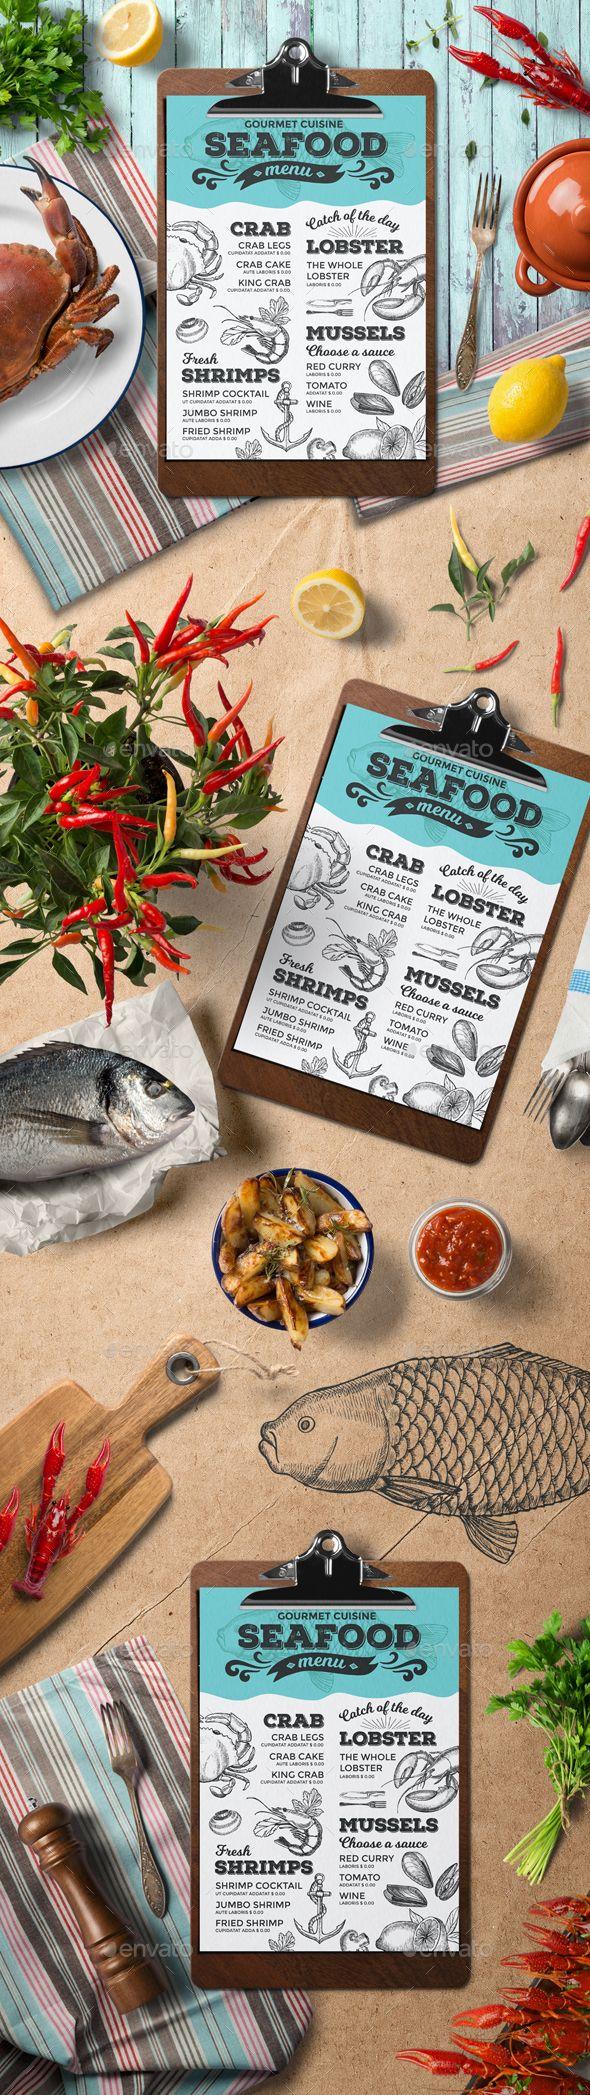 Seafood Menu Template — Photoshop PSD #8.2x11.6 #shrimp • Download ➝ https://graphicriver.net/item/seafood-menu-template/19660360?ref=pxcr